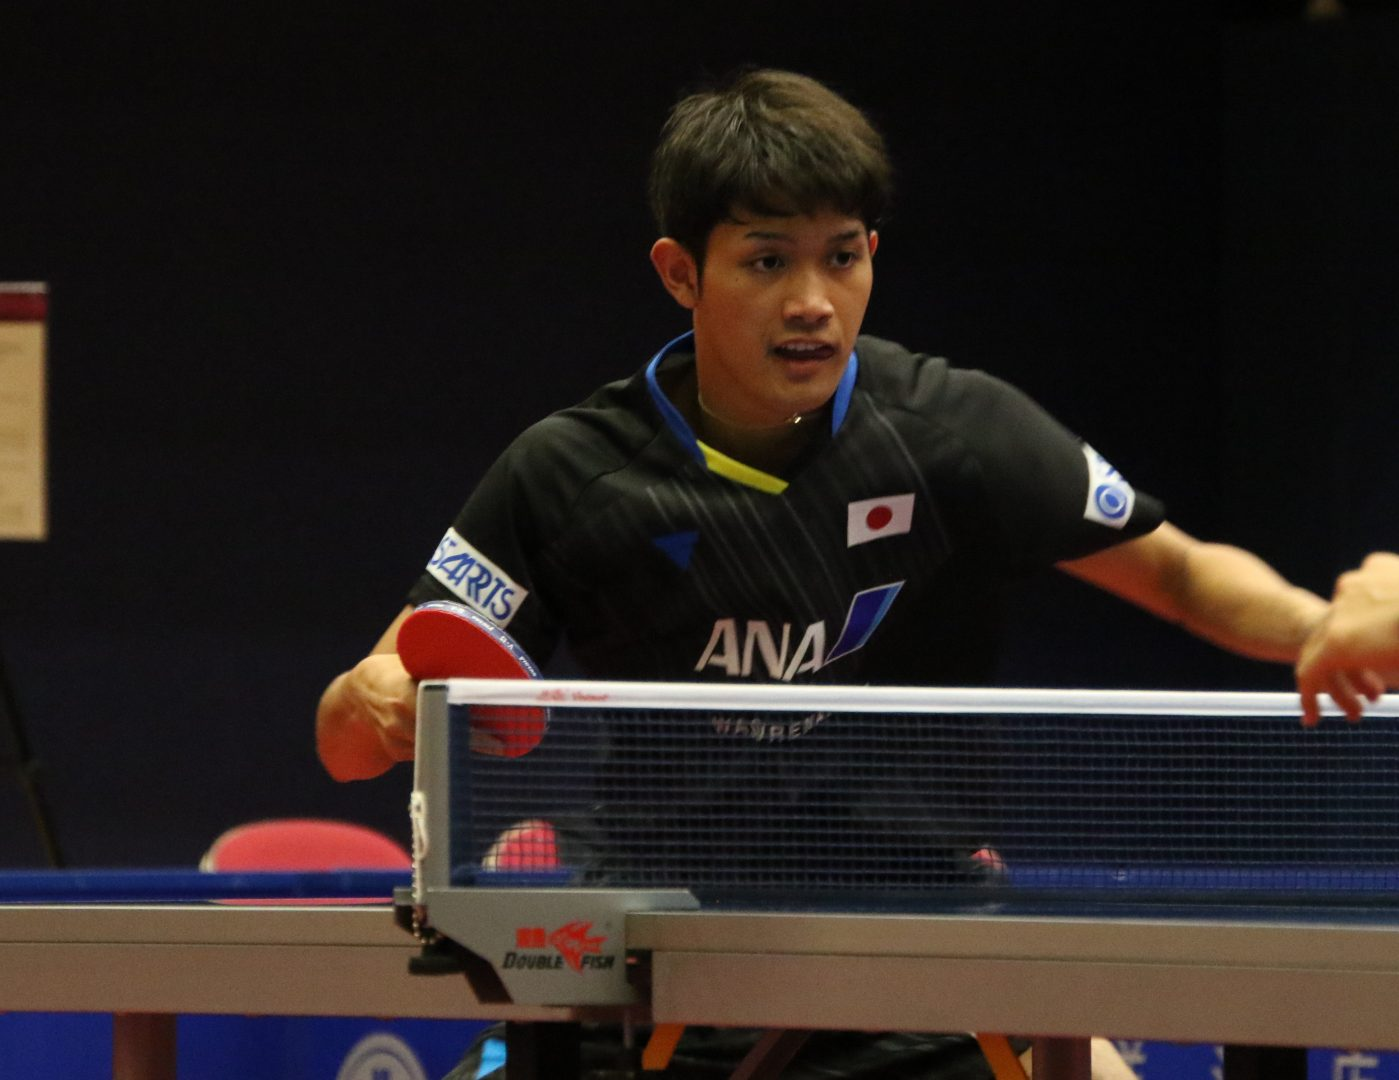 【卓球】前年王者・吉村和弘、連覇に向けて好発進<香港OP・男子>